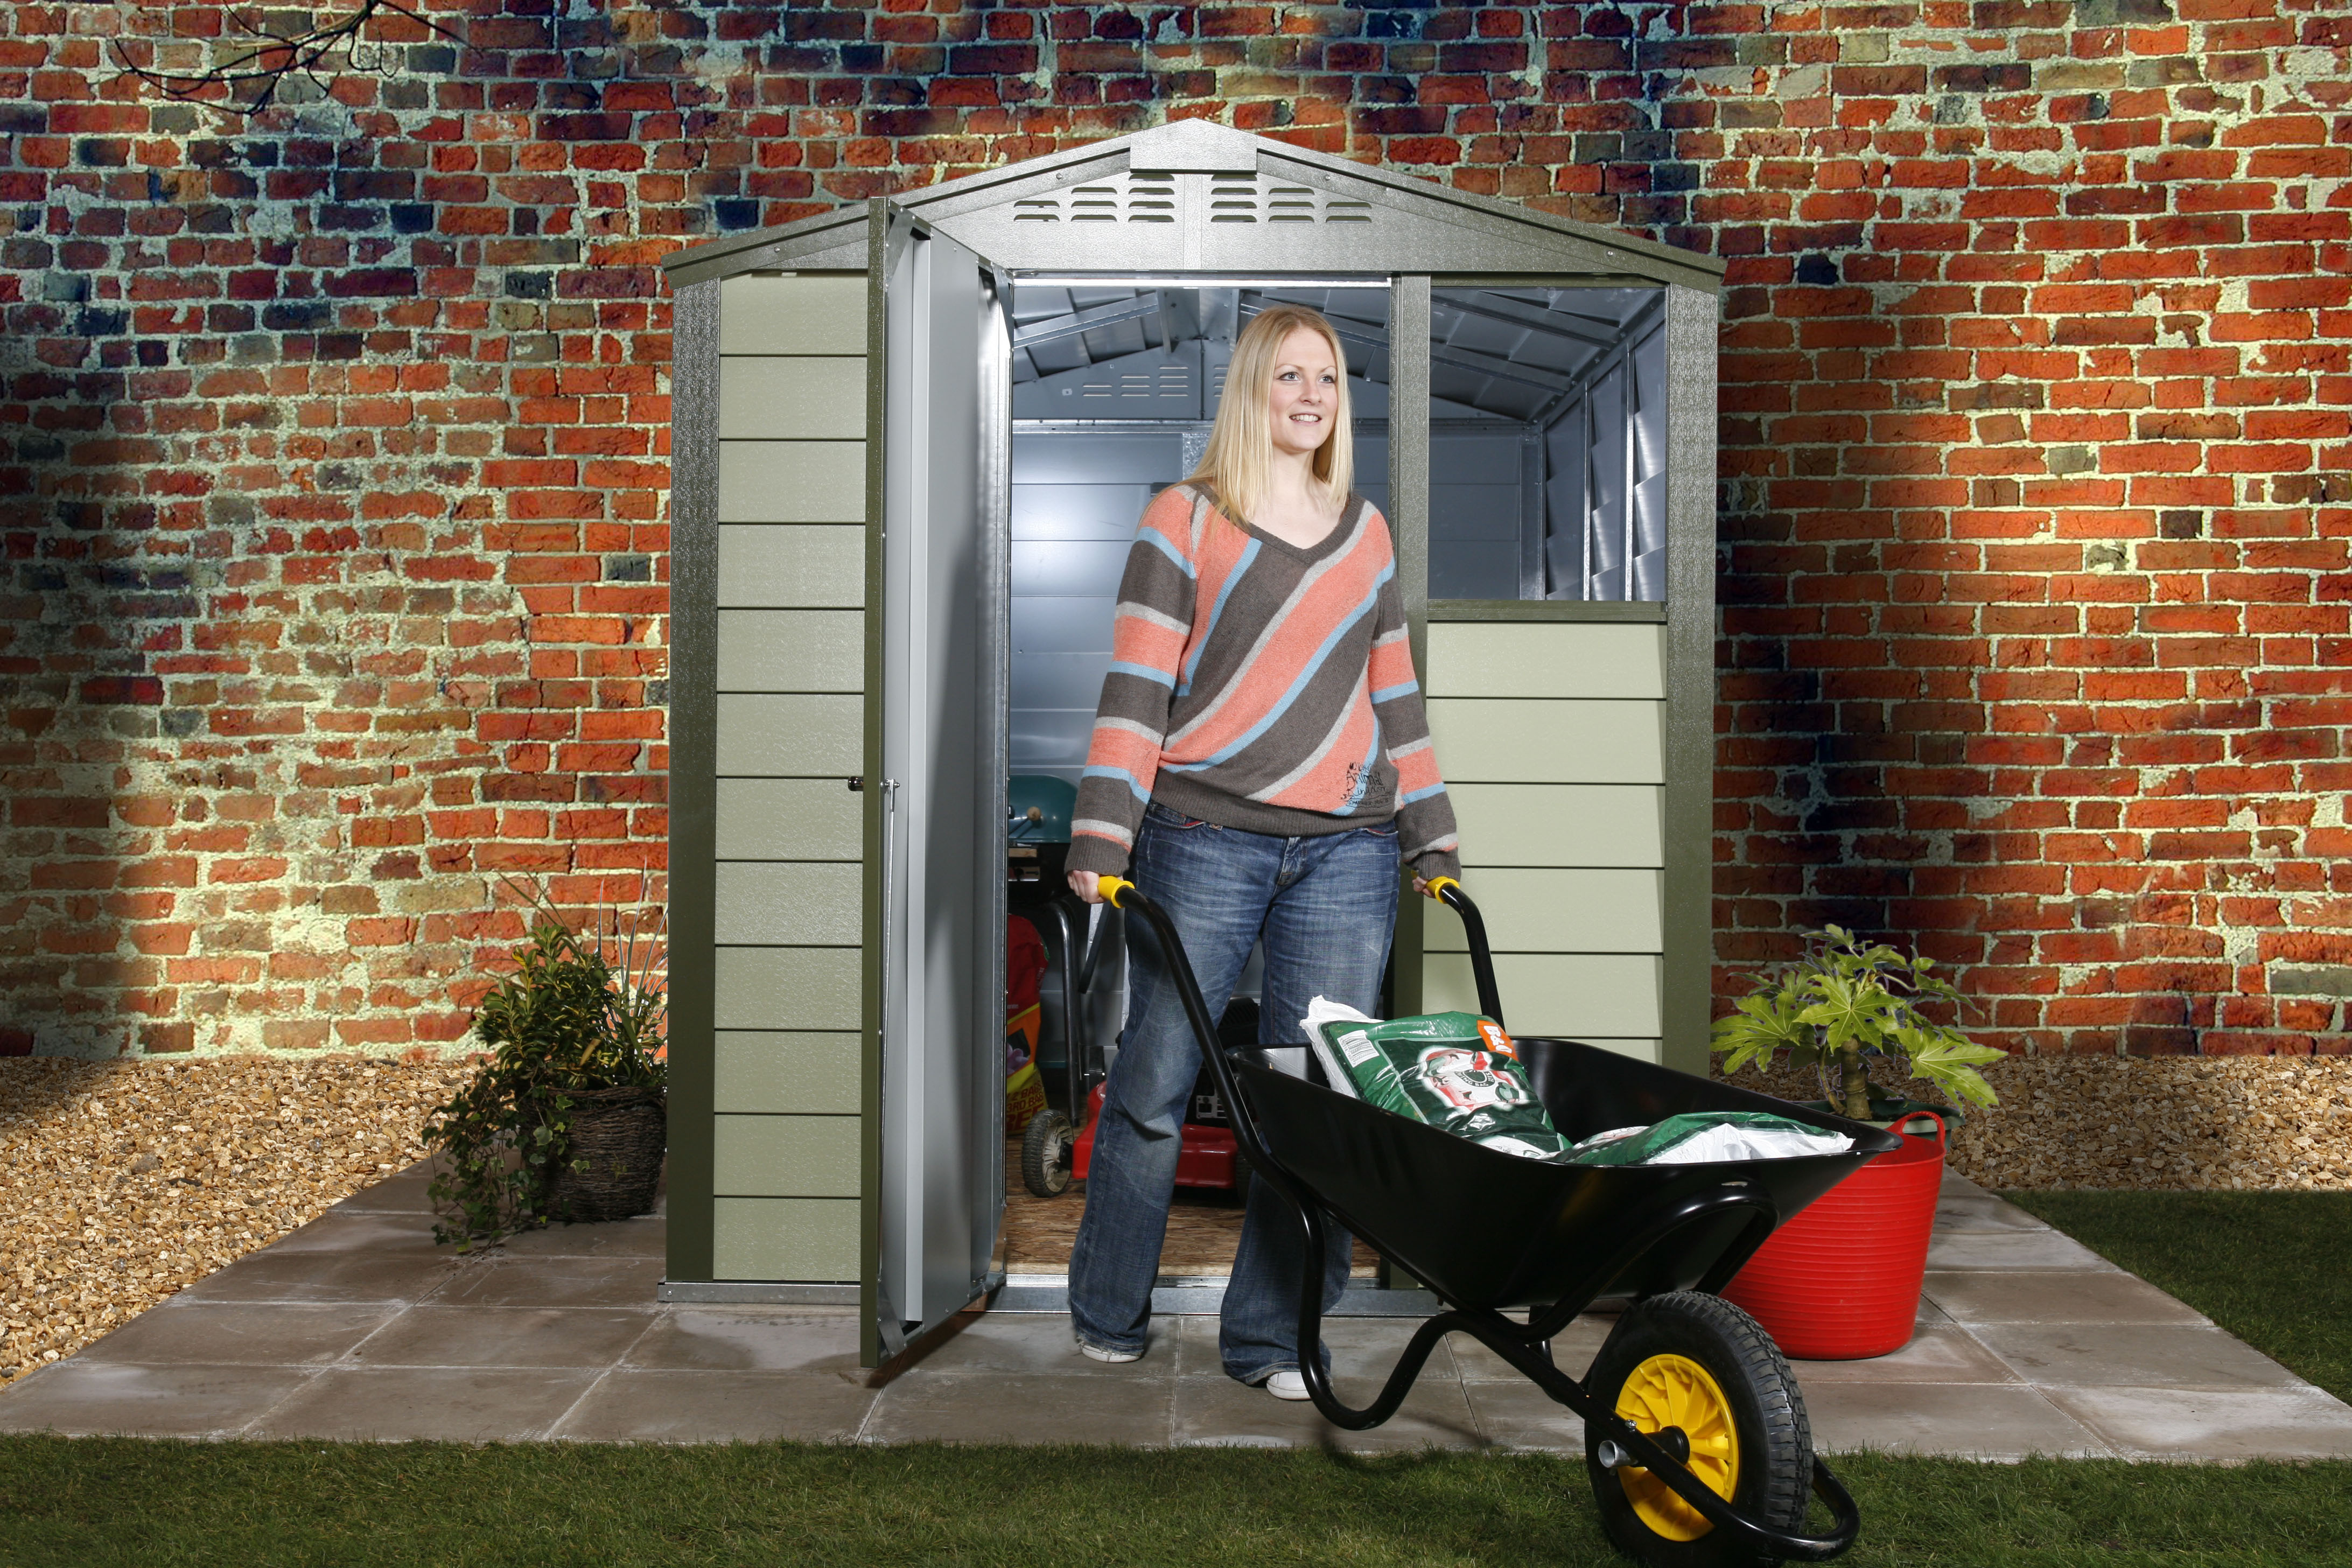 Shed for storing garden furniture during winter